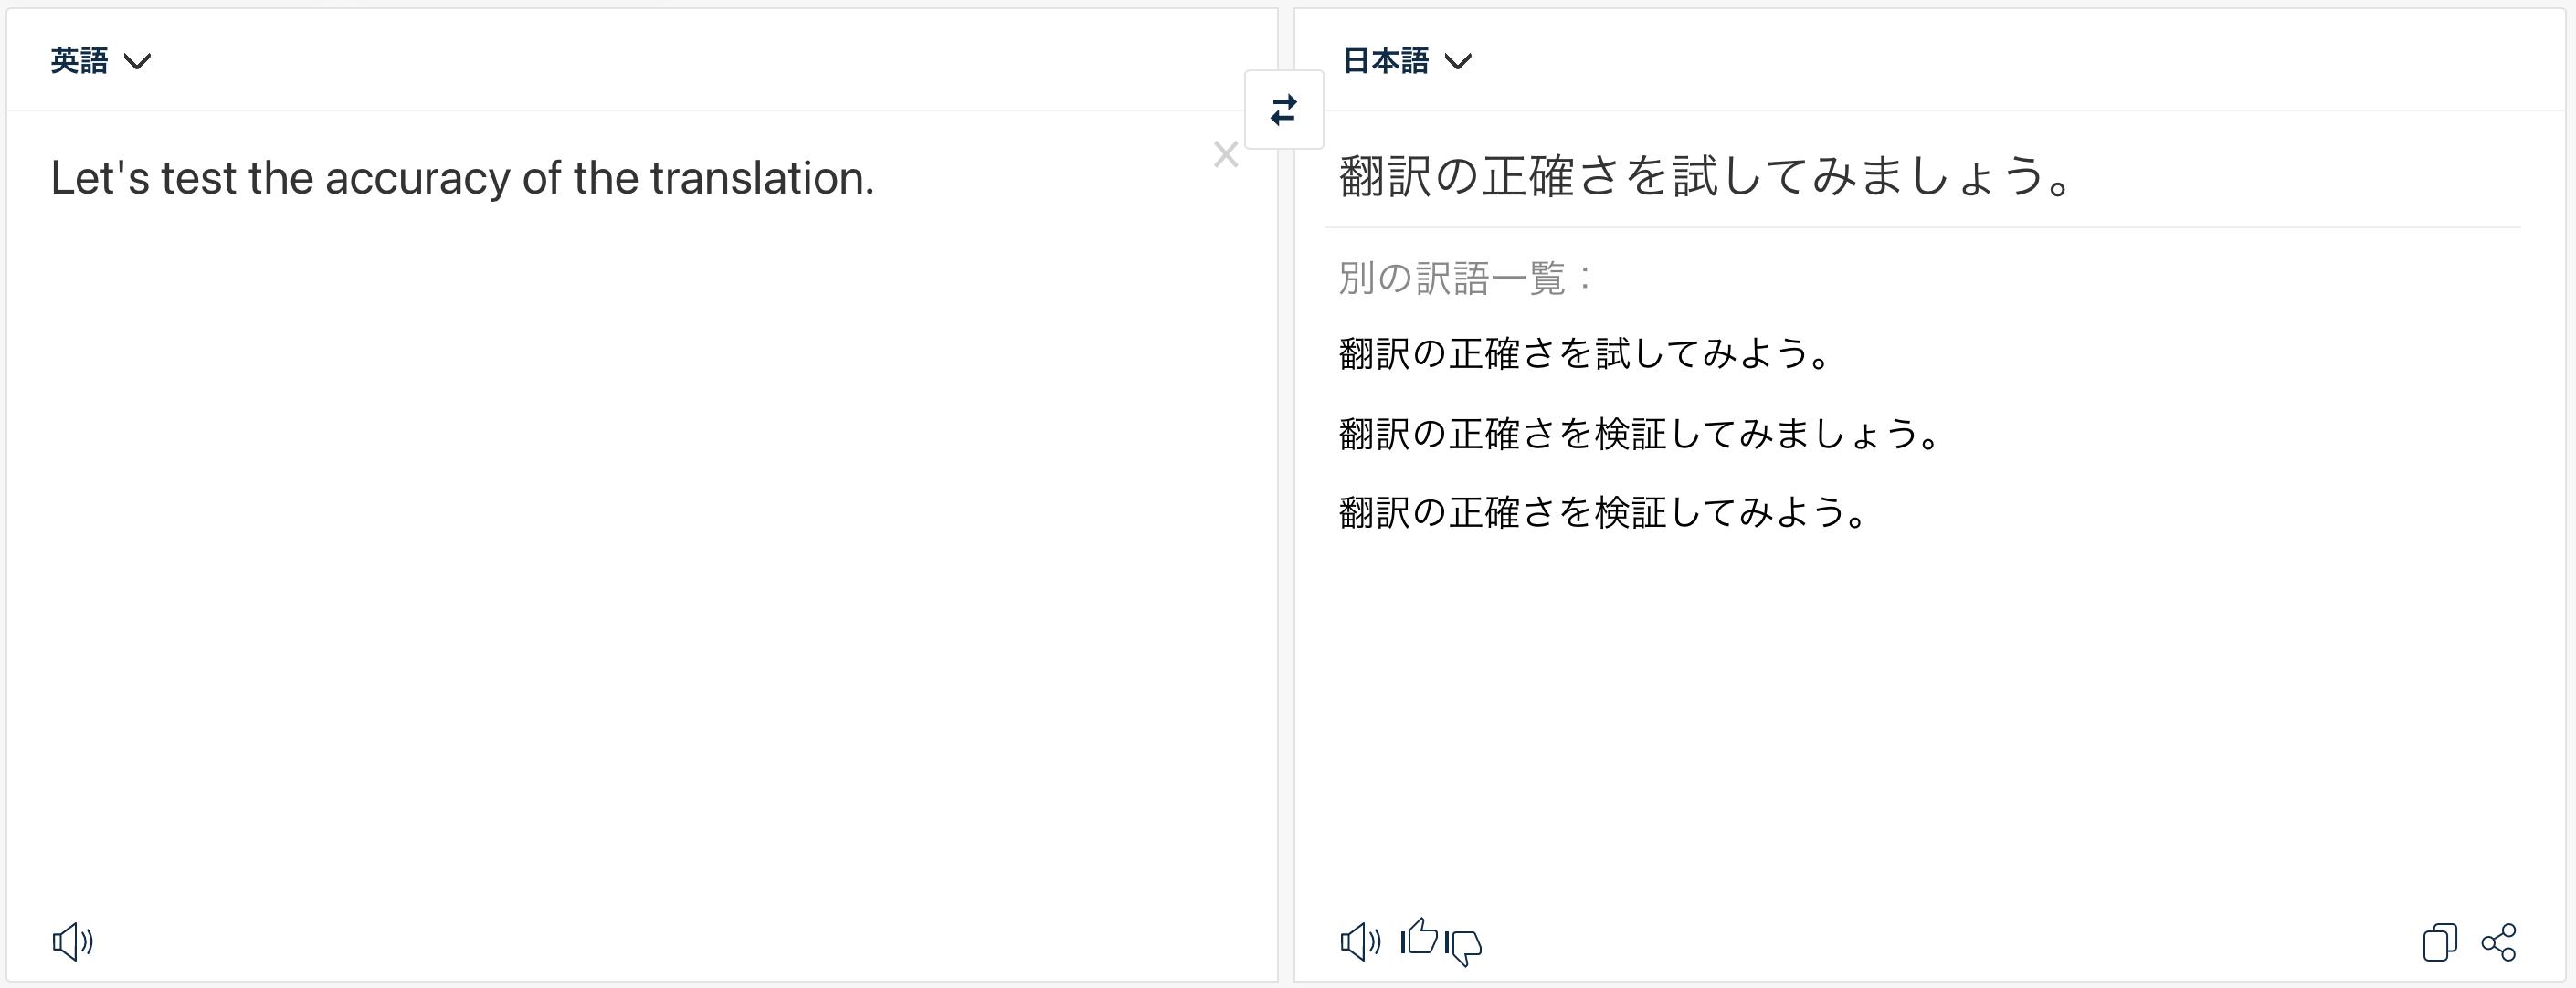 DeepL翻訳画面